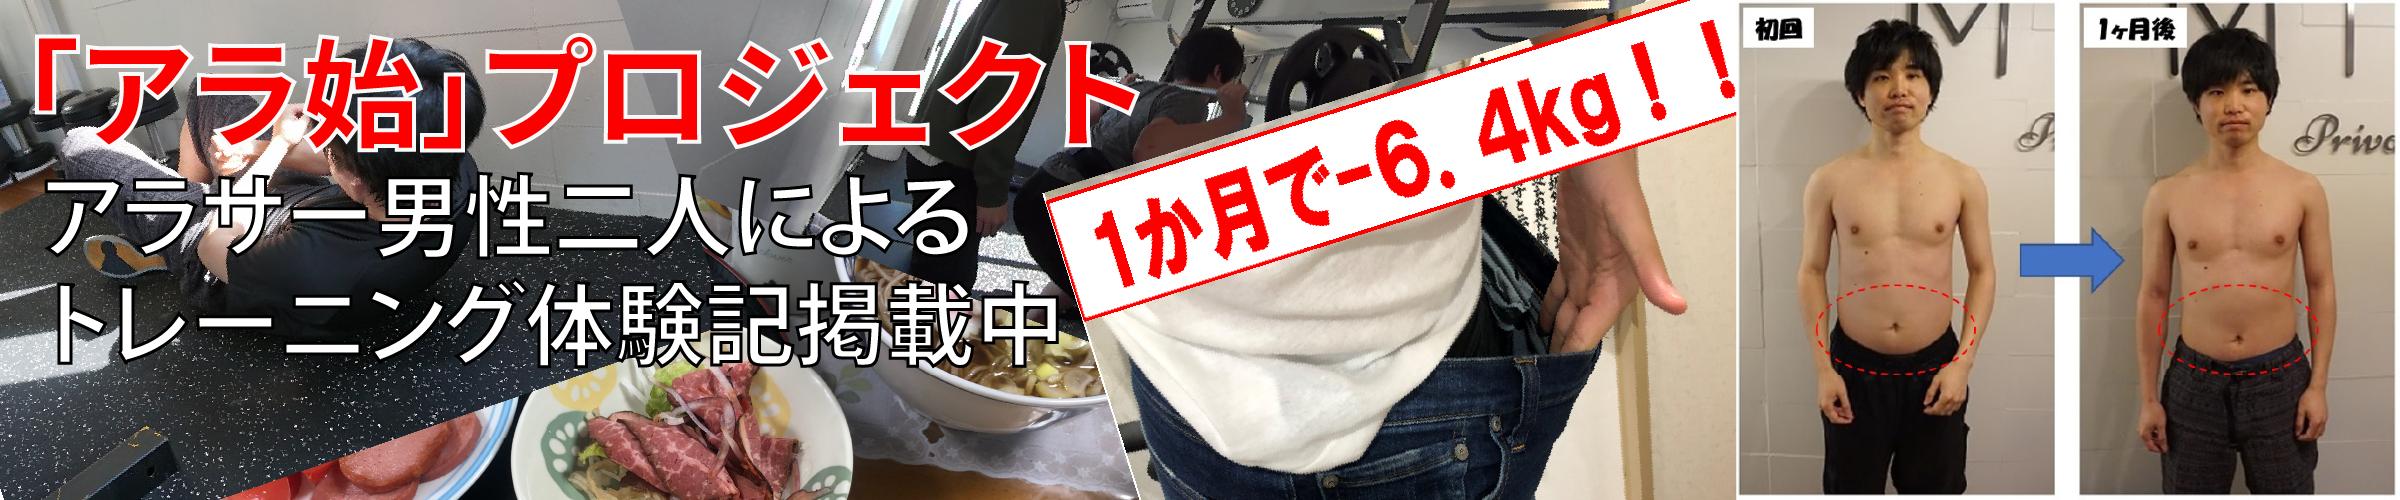 MIROブログ 「アラ始」1カ月経過報告